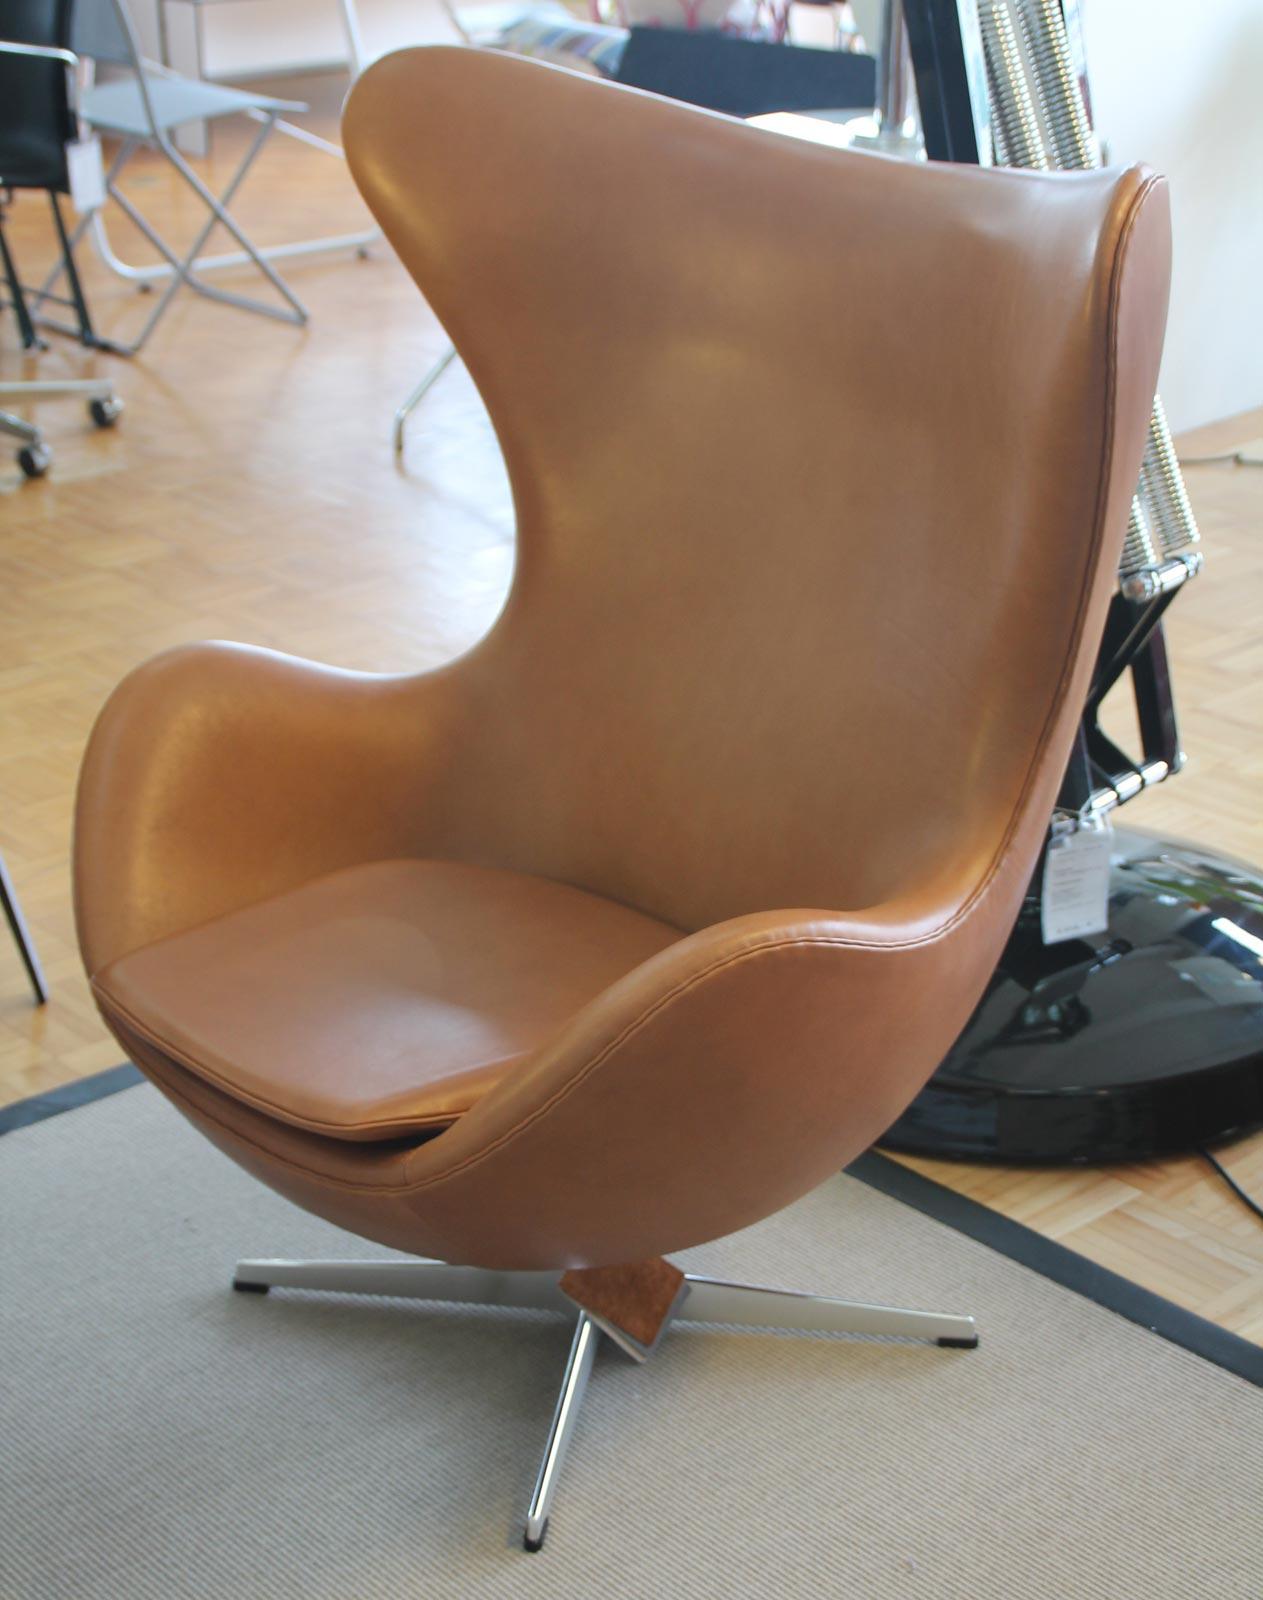 fritz hansen sessel das ei das ei egg chair sessel fritz. Black Bedroom Furniture Sets. Home Design Ideas